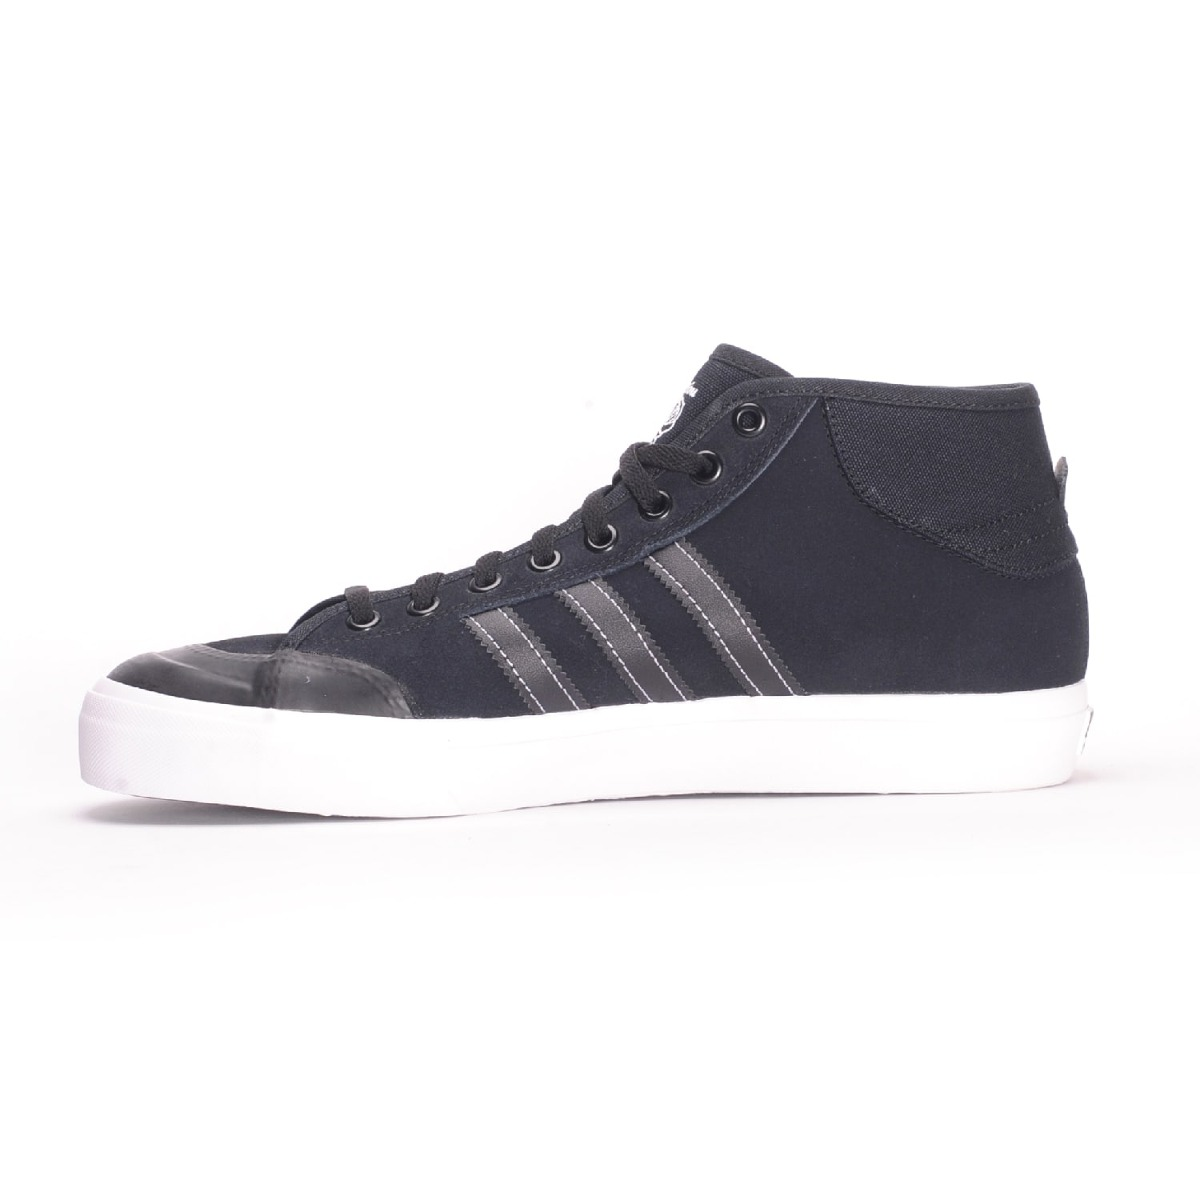 Cargando mid matchcourt calzado zoom adidas gTtn7wq1